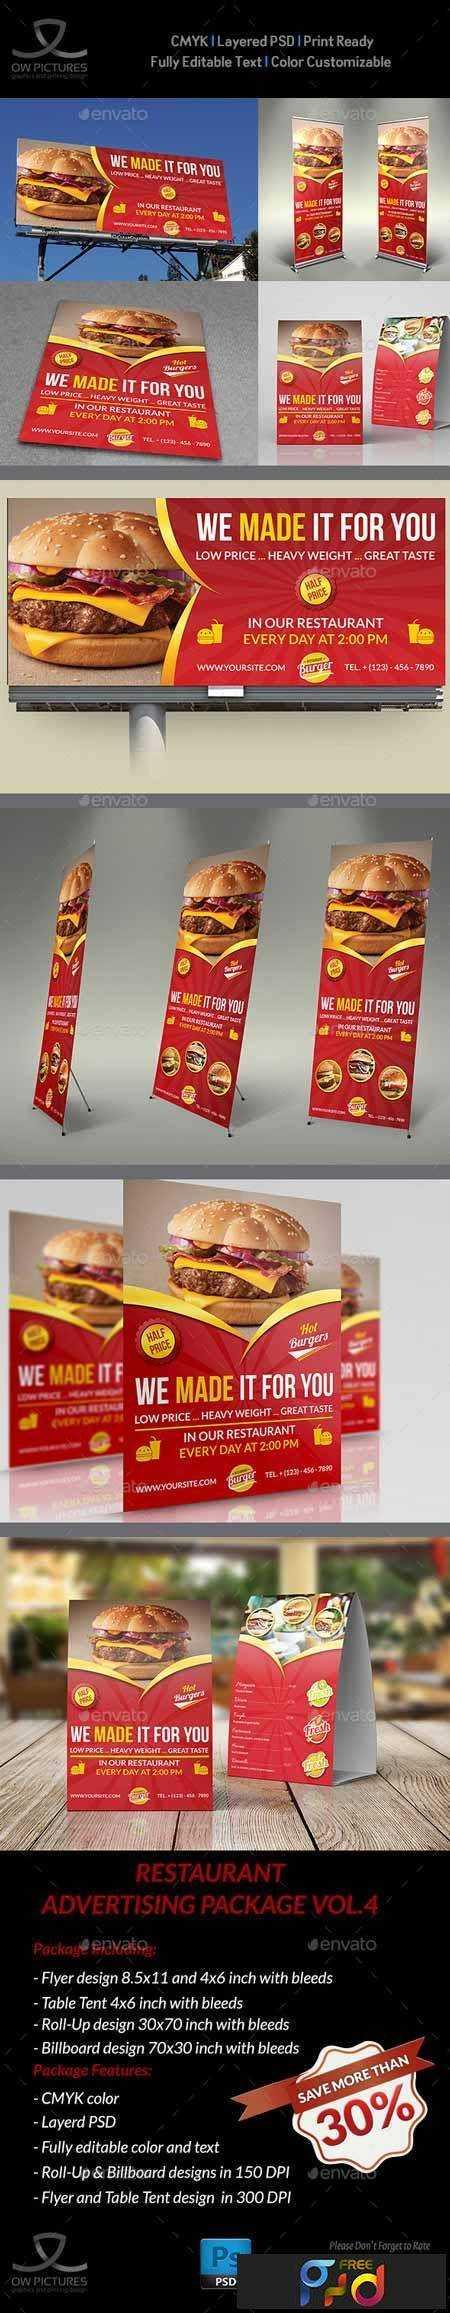 freepsdvn-com_1432522287_restaurant-advertising-bundle-vol4-11331402